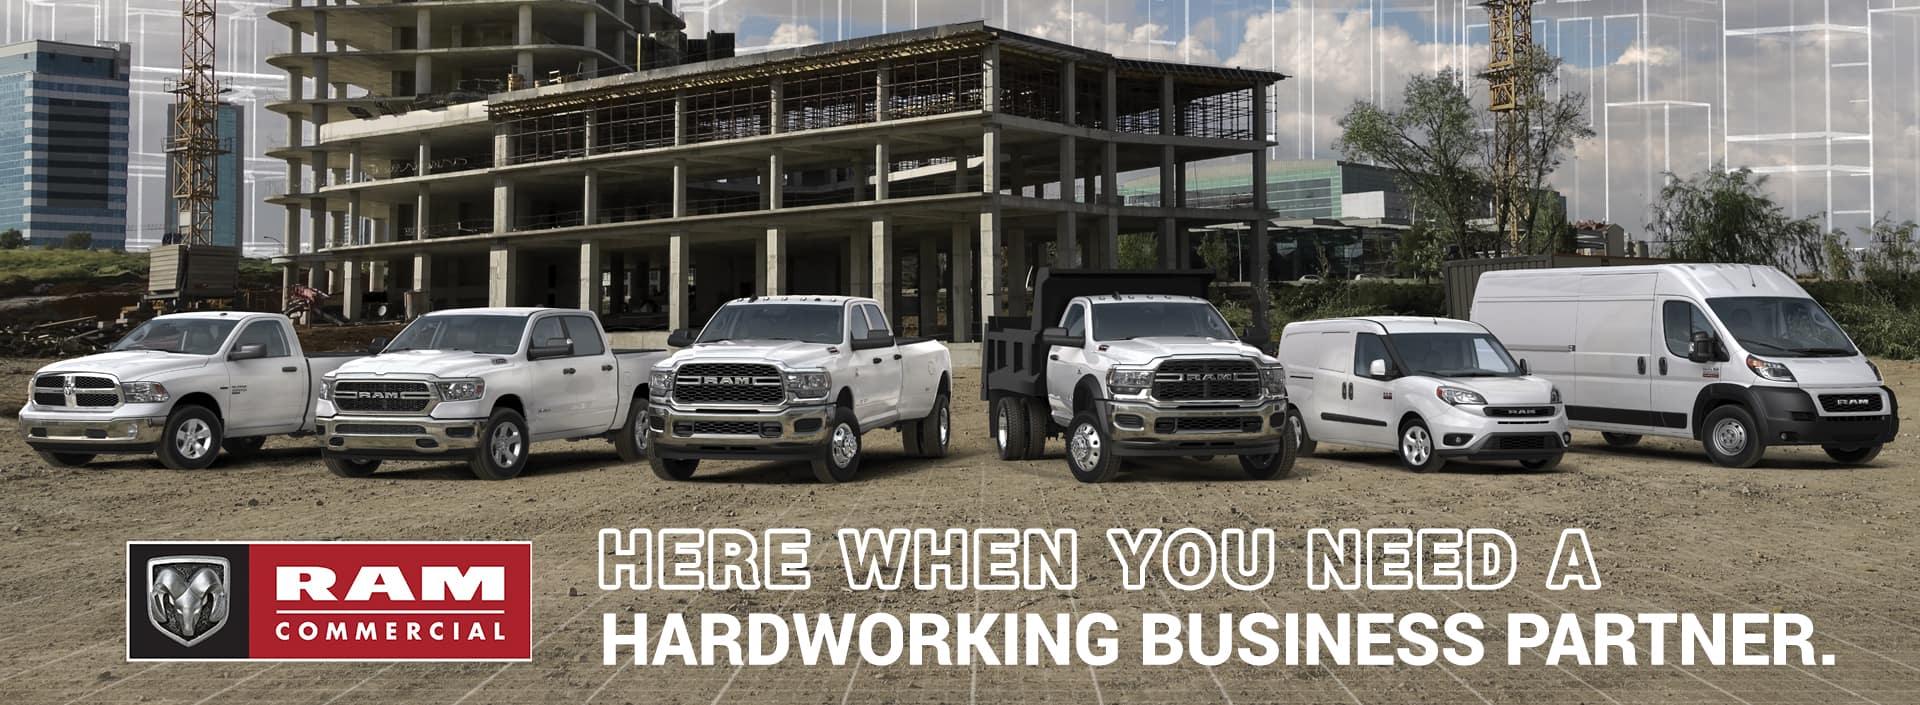 Oviedo RAM Commercial Truck Season